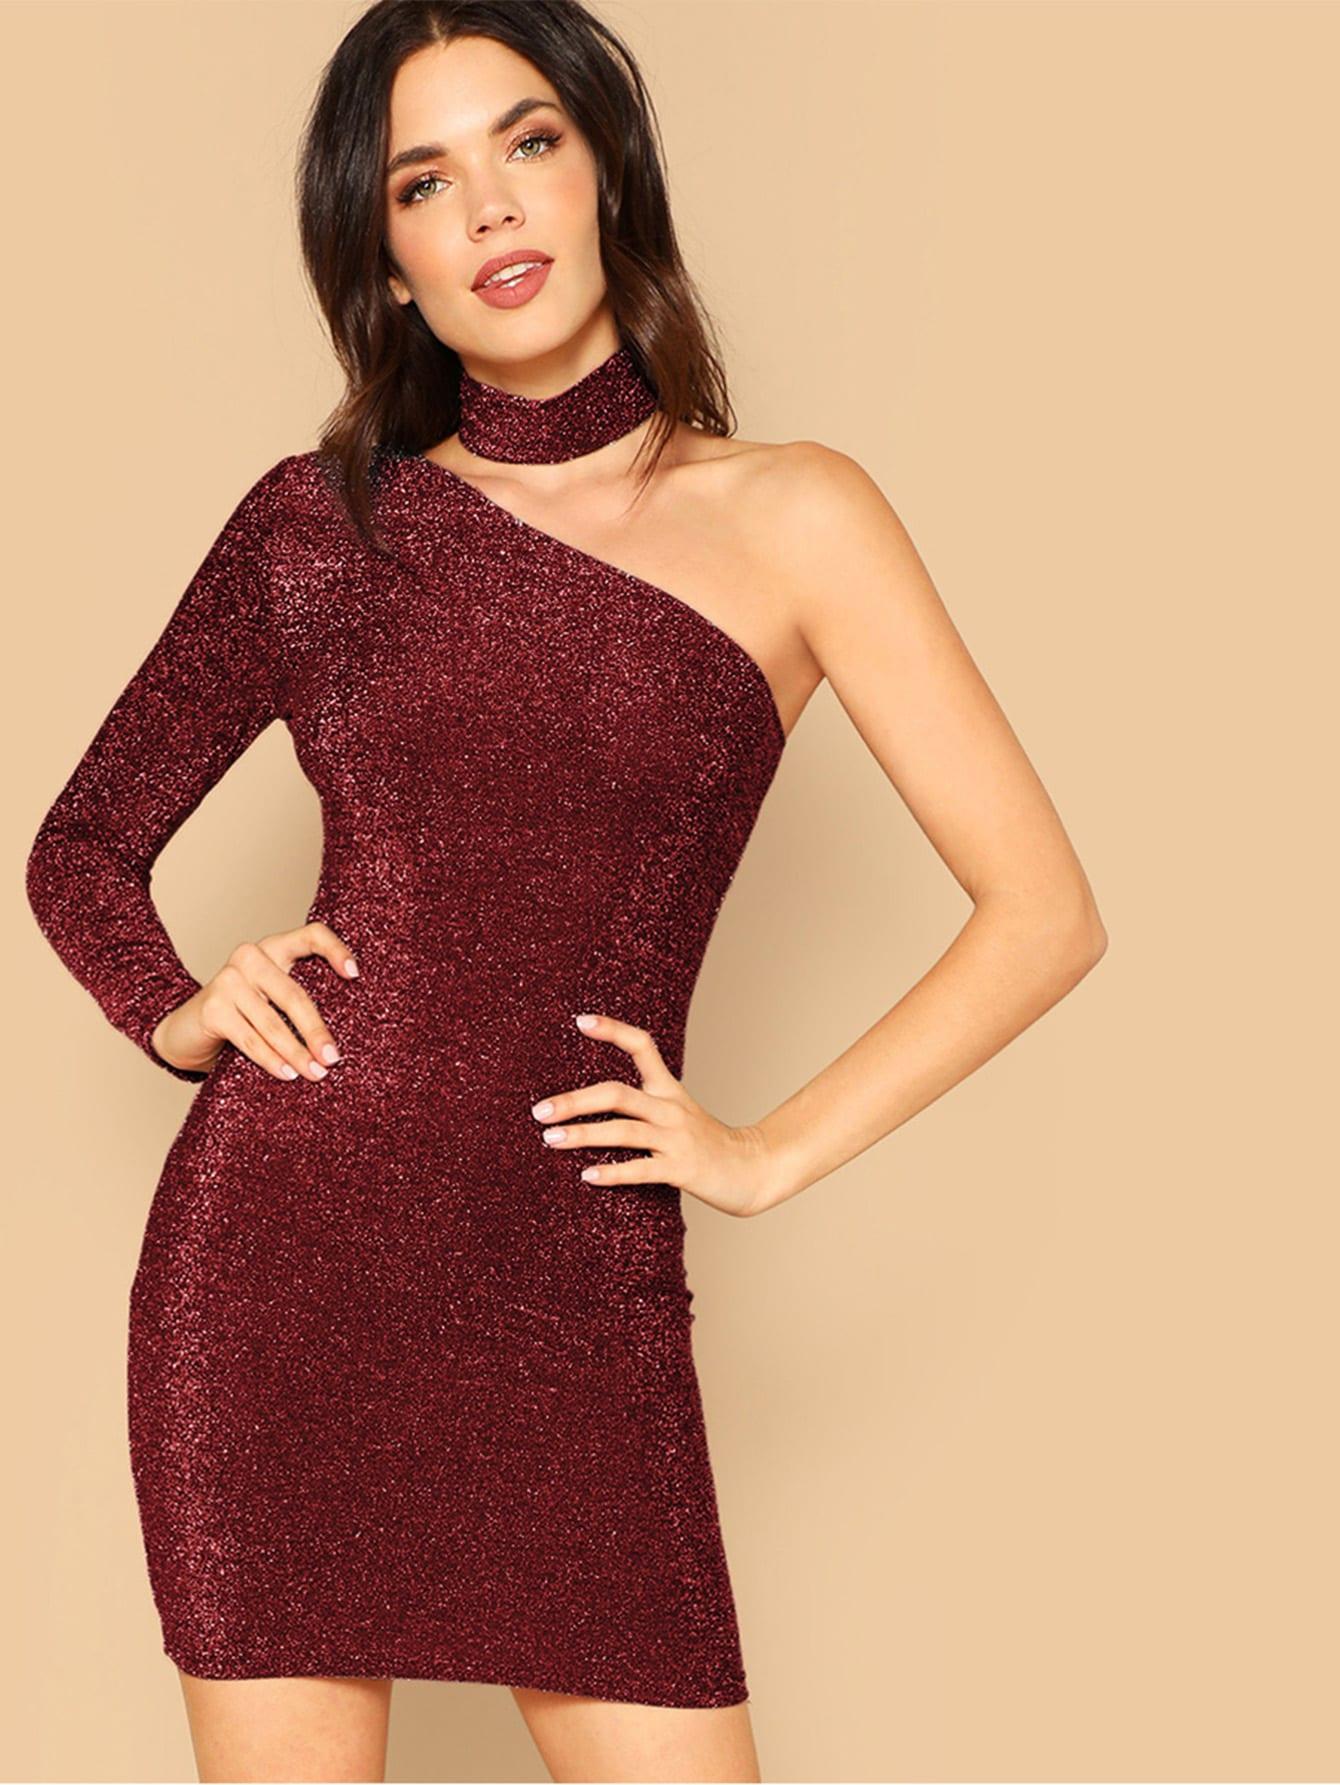 38a783f9801 Cheap One Shoulder Glitter Dress for sale Australia